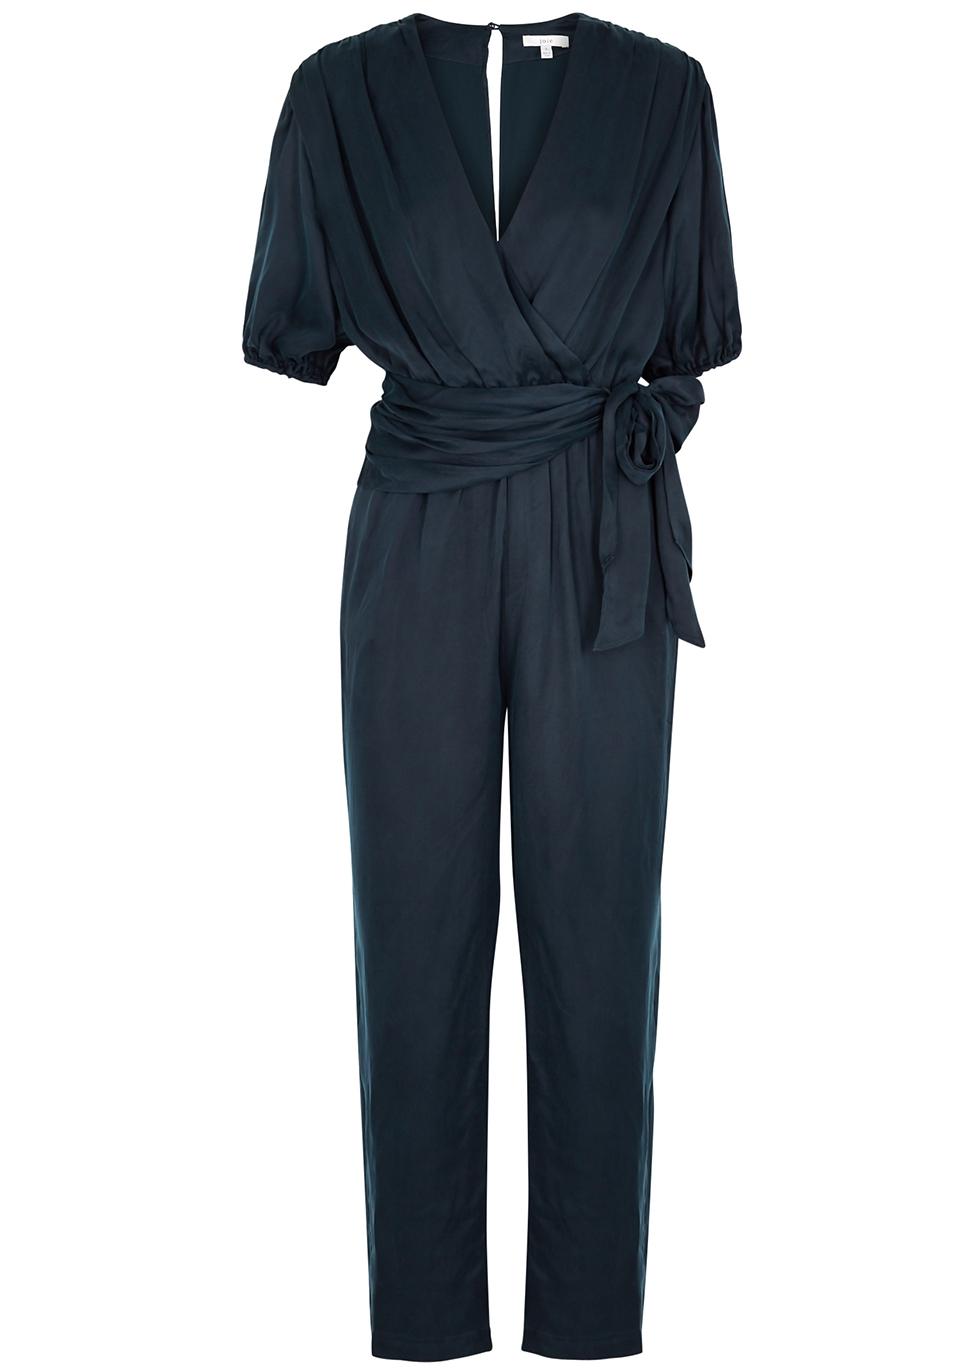 Adalie navy cupro jumpsuit